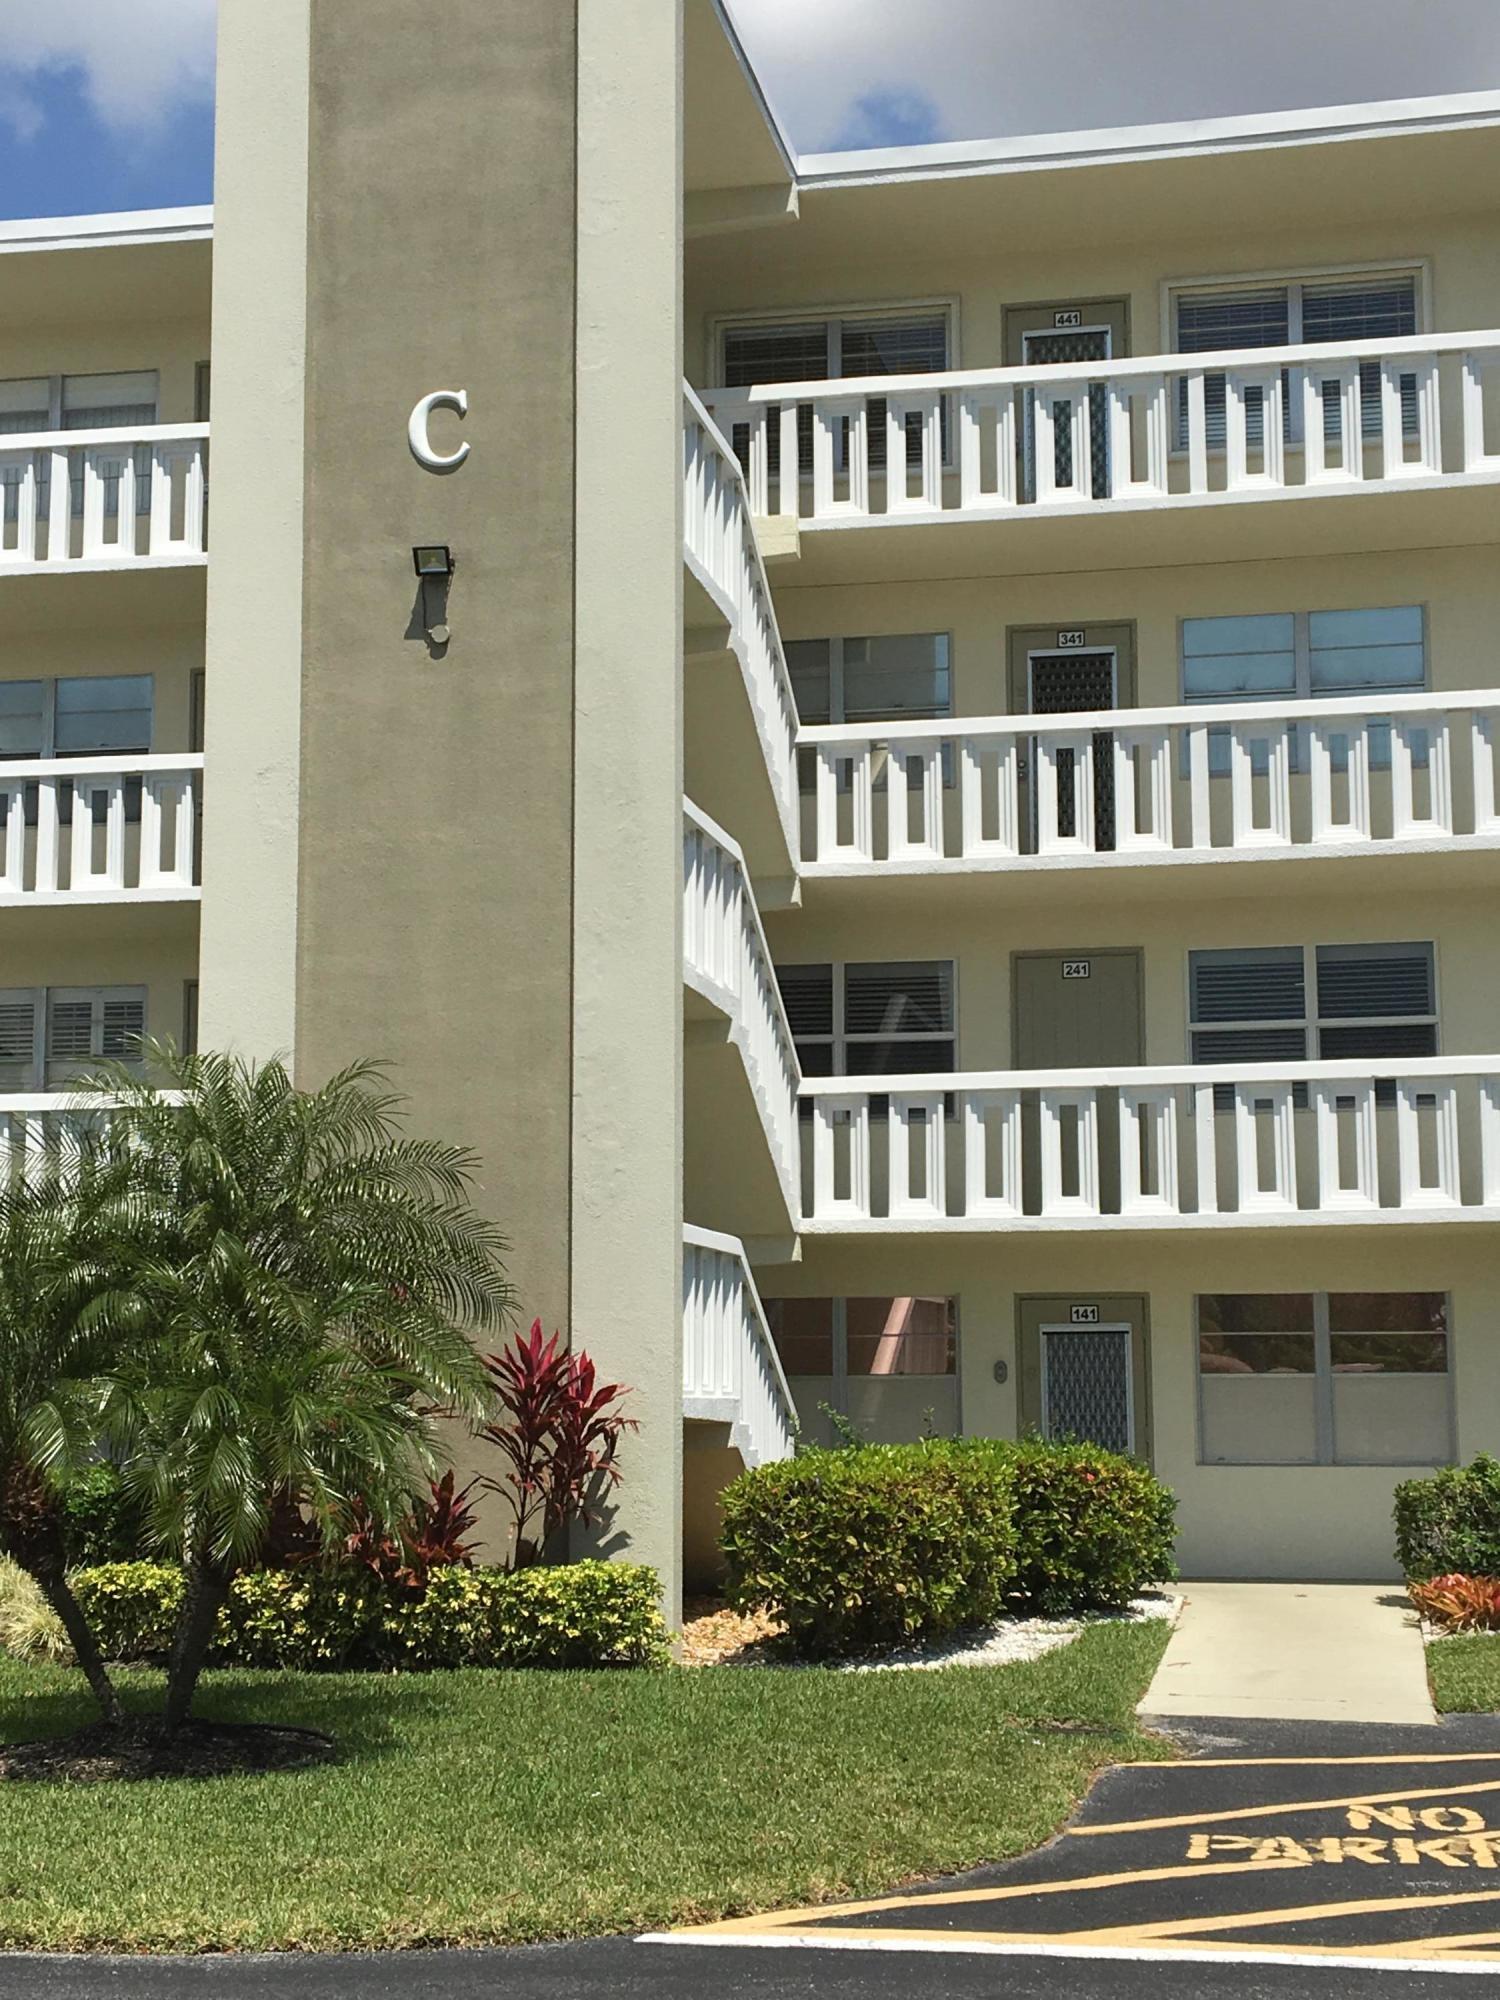 Photo of 242 Grantham C #242, Deerfield Beach, FL 33442